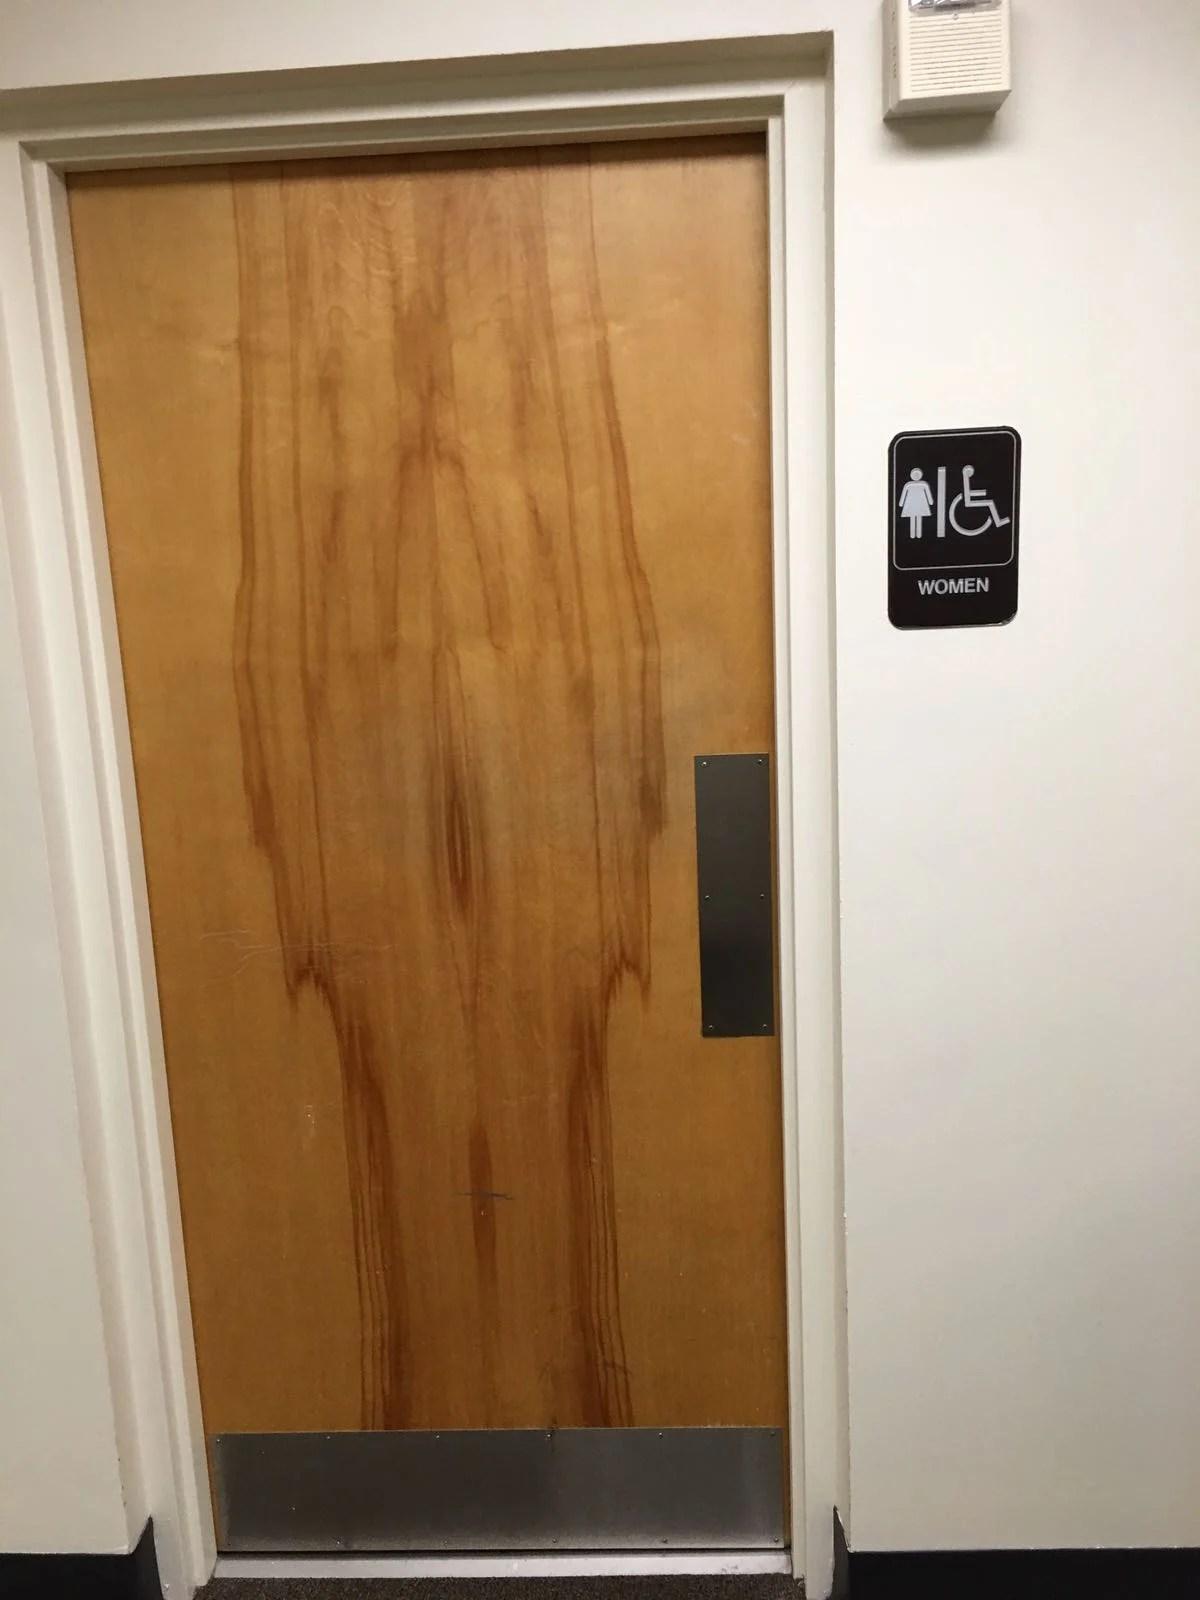 These Bathroom Doors Have Very Appropriate Wood Grain The Poke